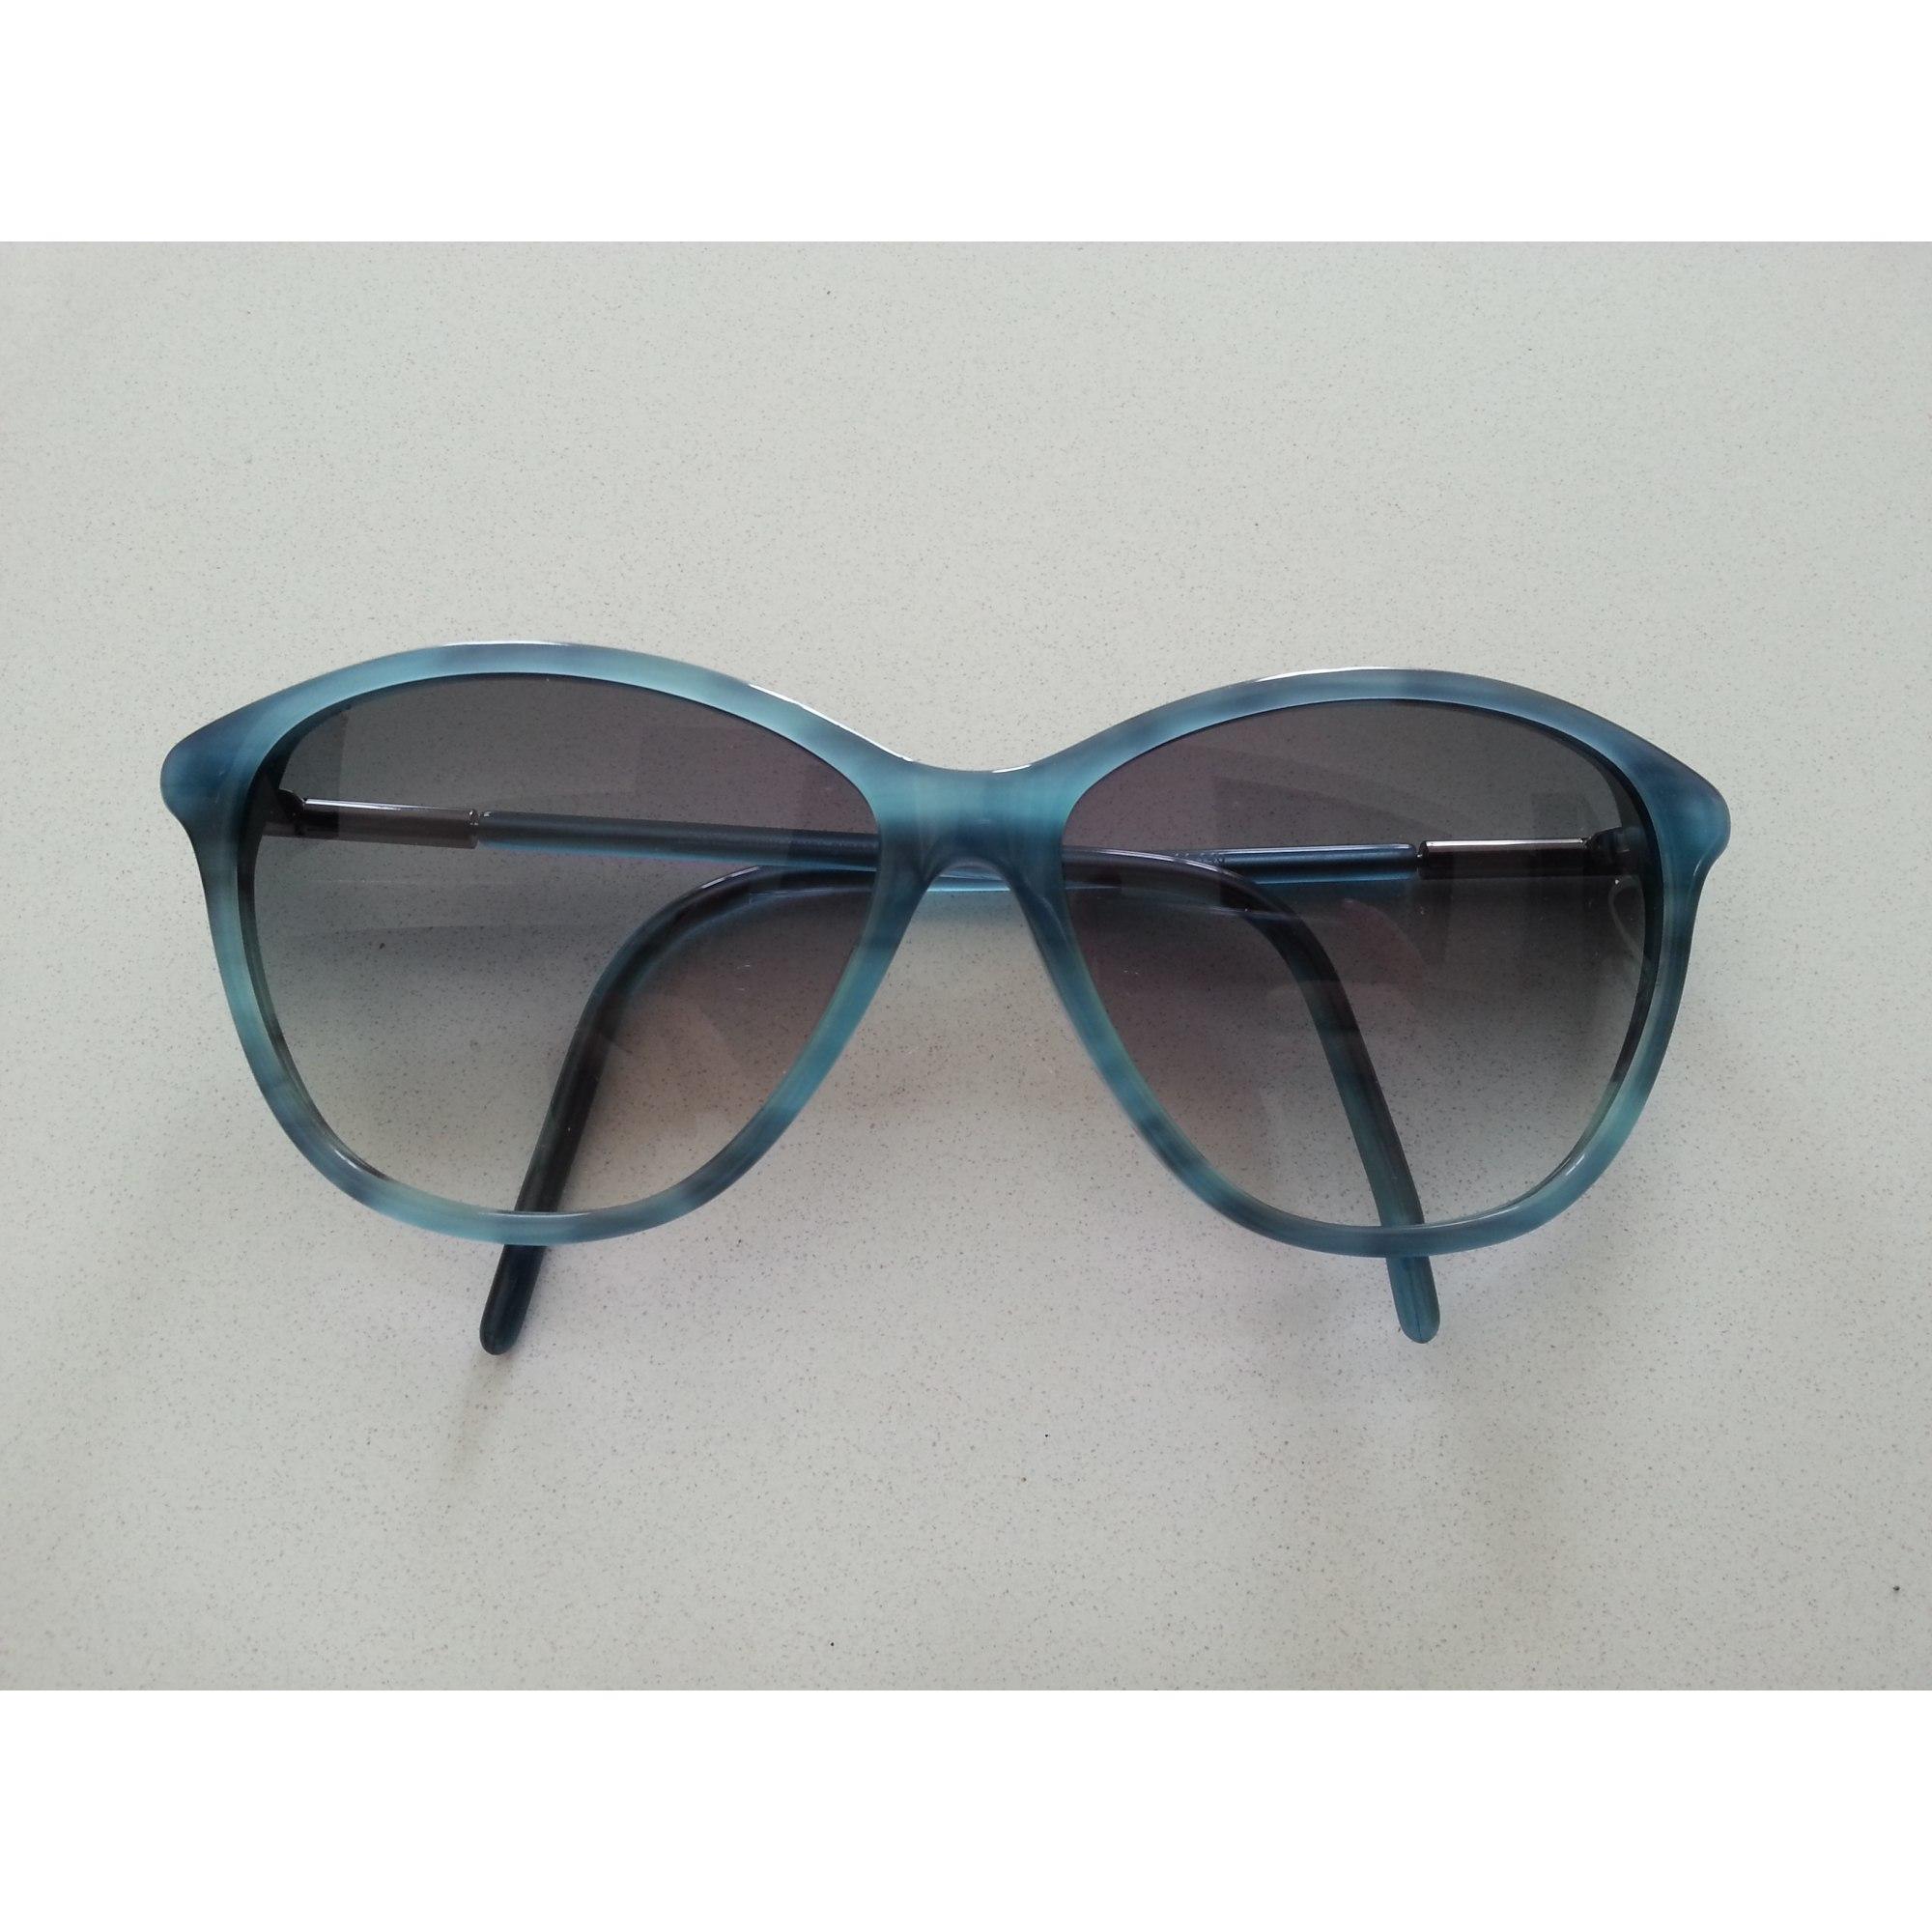 Lunettes de soleil LEVEL Bleu, bleu marine, bleu turquoise 5b093745258e